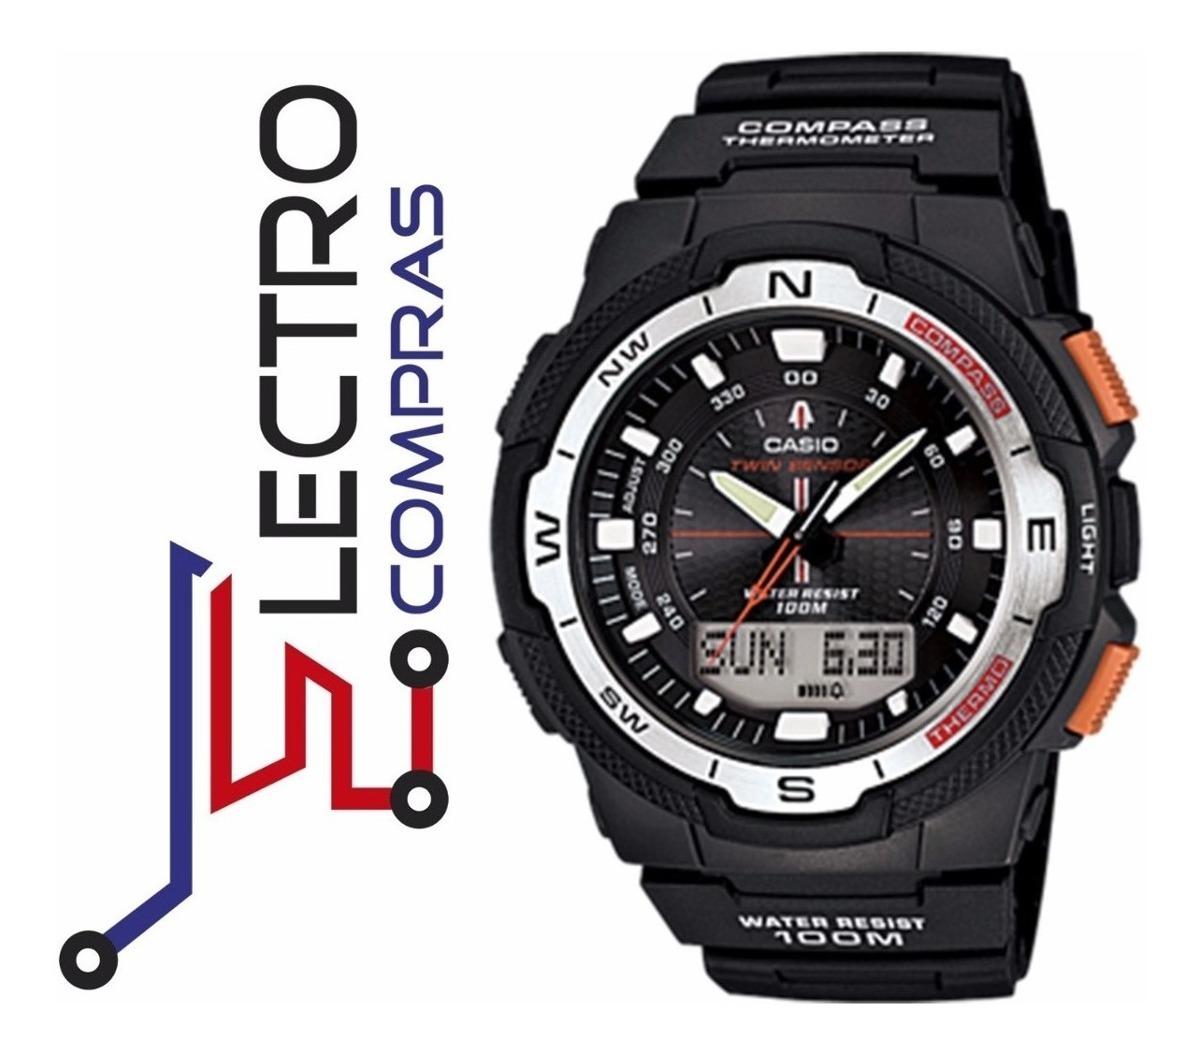 Reloj 1b Termometro Brujula 100m 500h Casio Sgw 4AL5c3Rjq